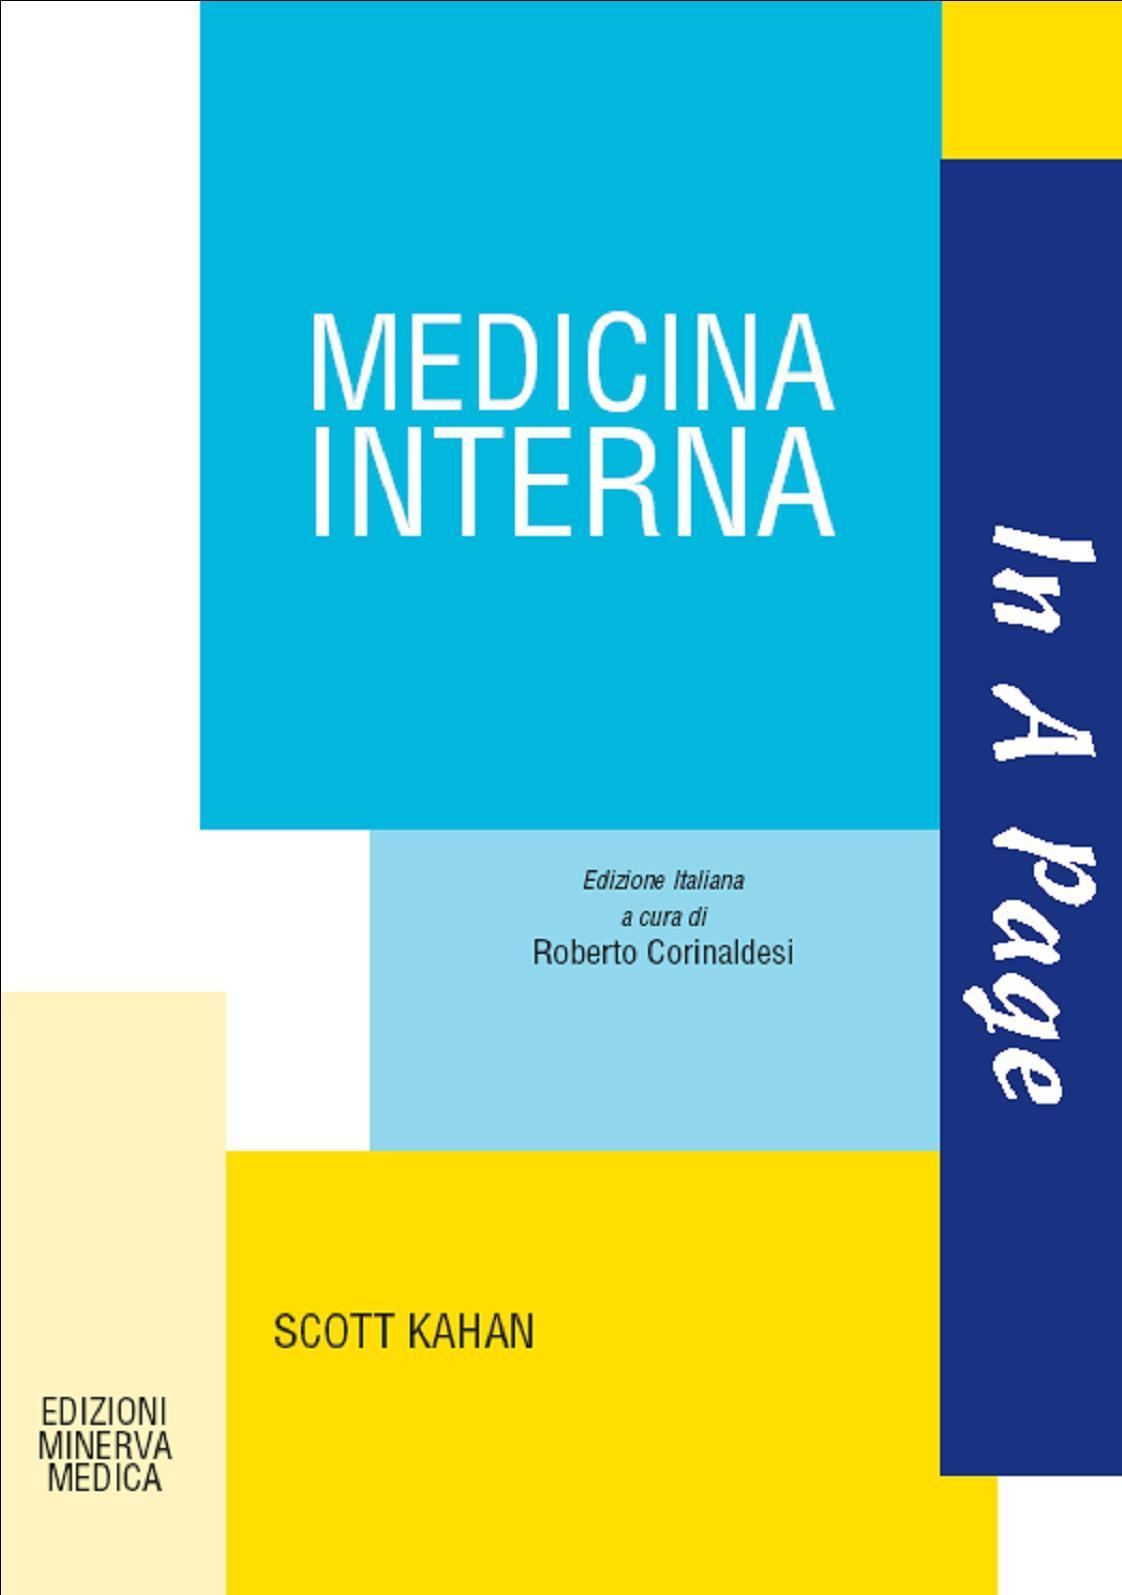 In a page Medicina interna EB9788877116864